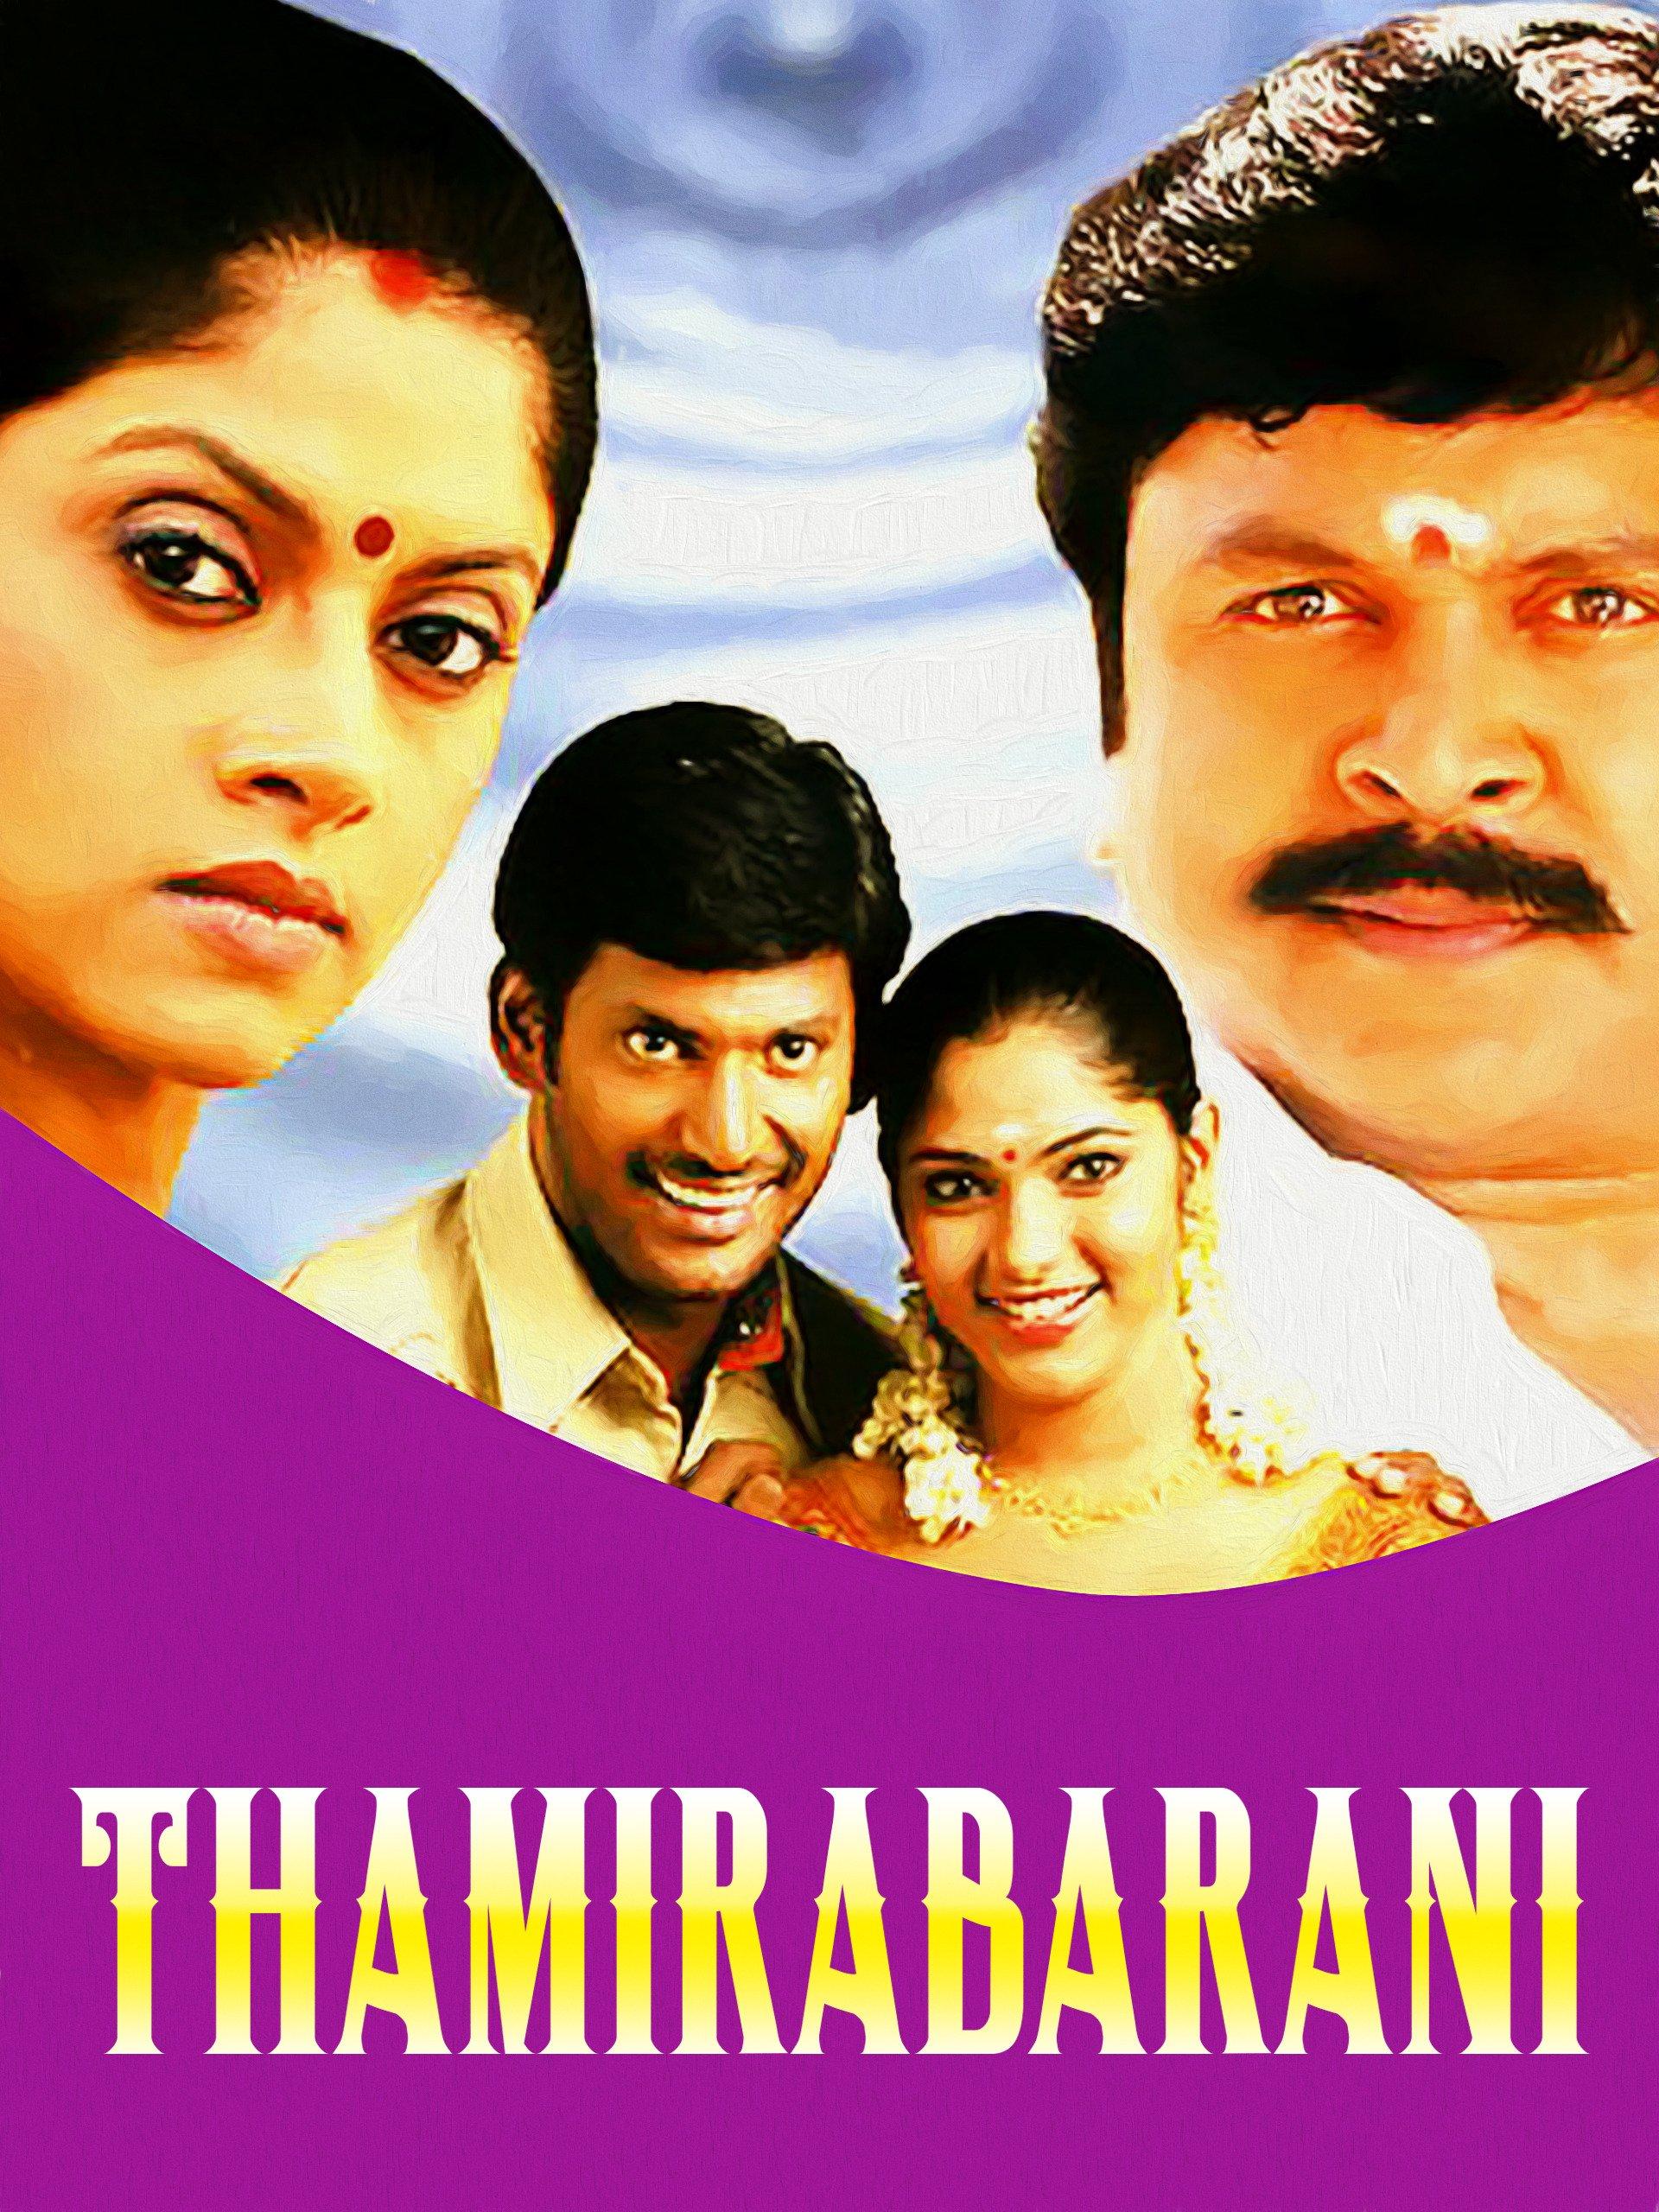 Thamirabharani 2007 576p WEBHD AVC Tamil[AAC 2 0] – Hon3y